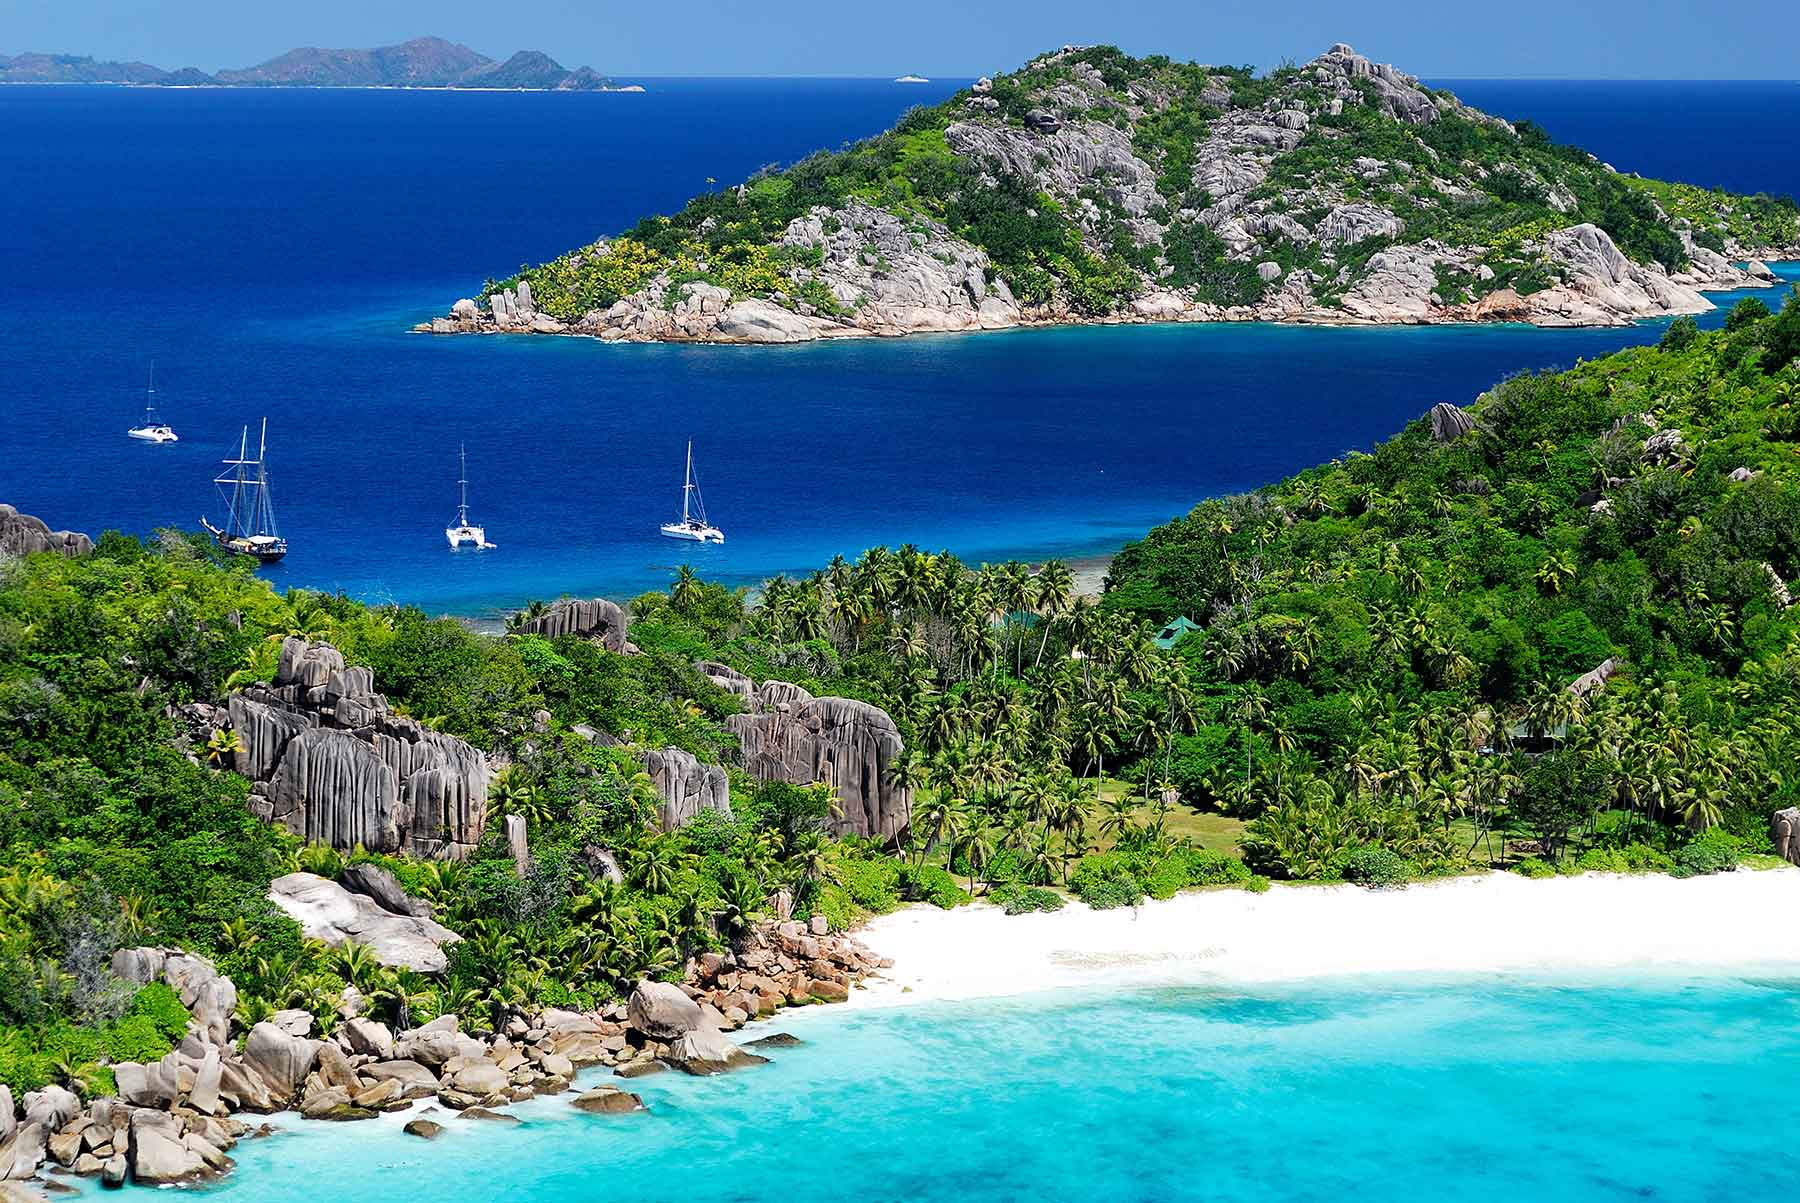 seychelles island hopper - borton overseas